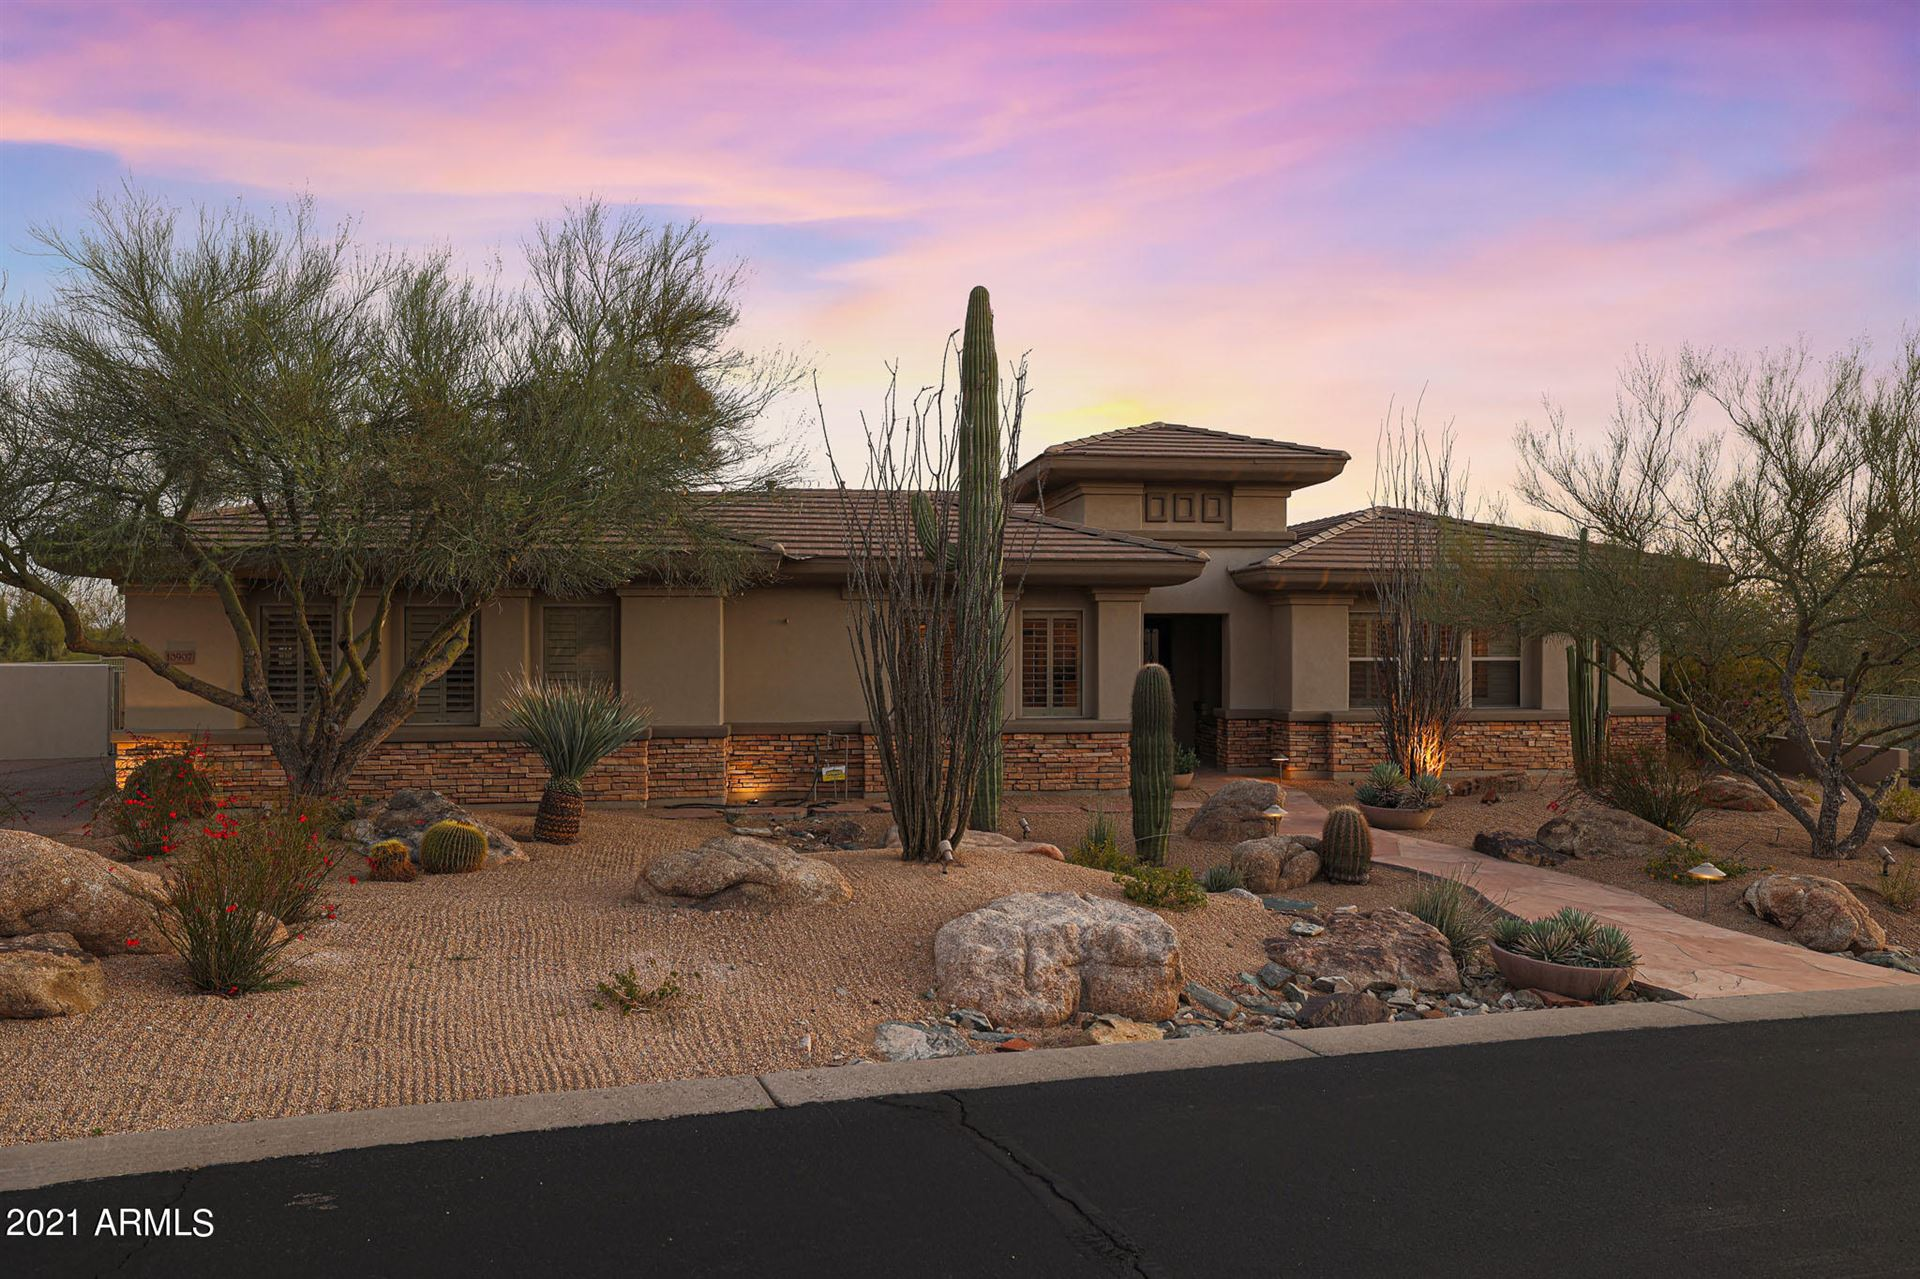 Photo of 10907 E MEADOWHILL Drive, Scottsdale, AZ 85255 (MLS # 6206866)